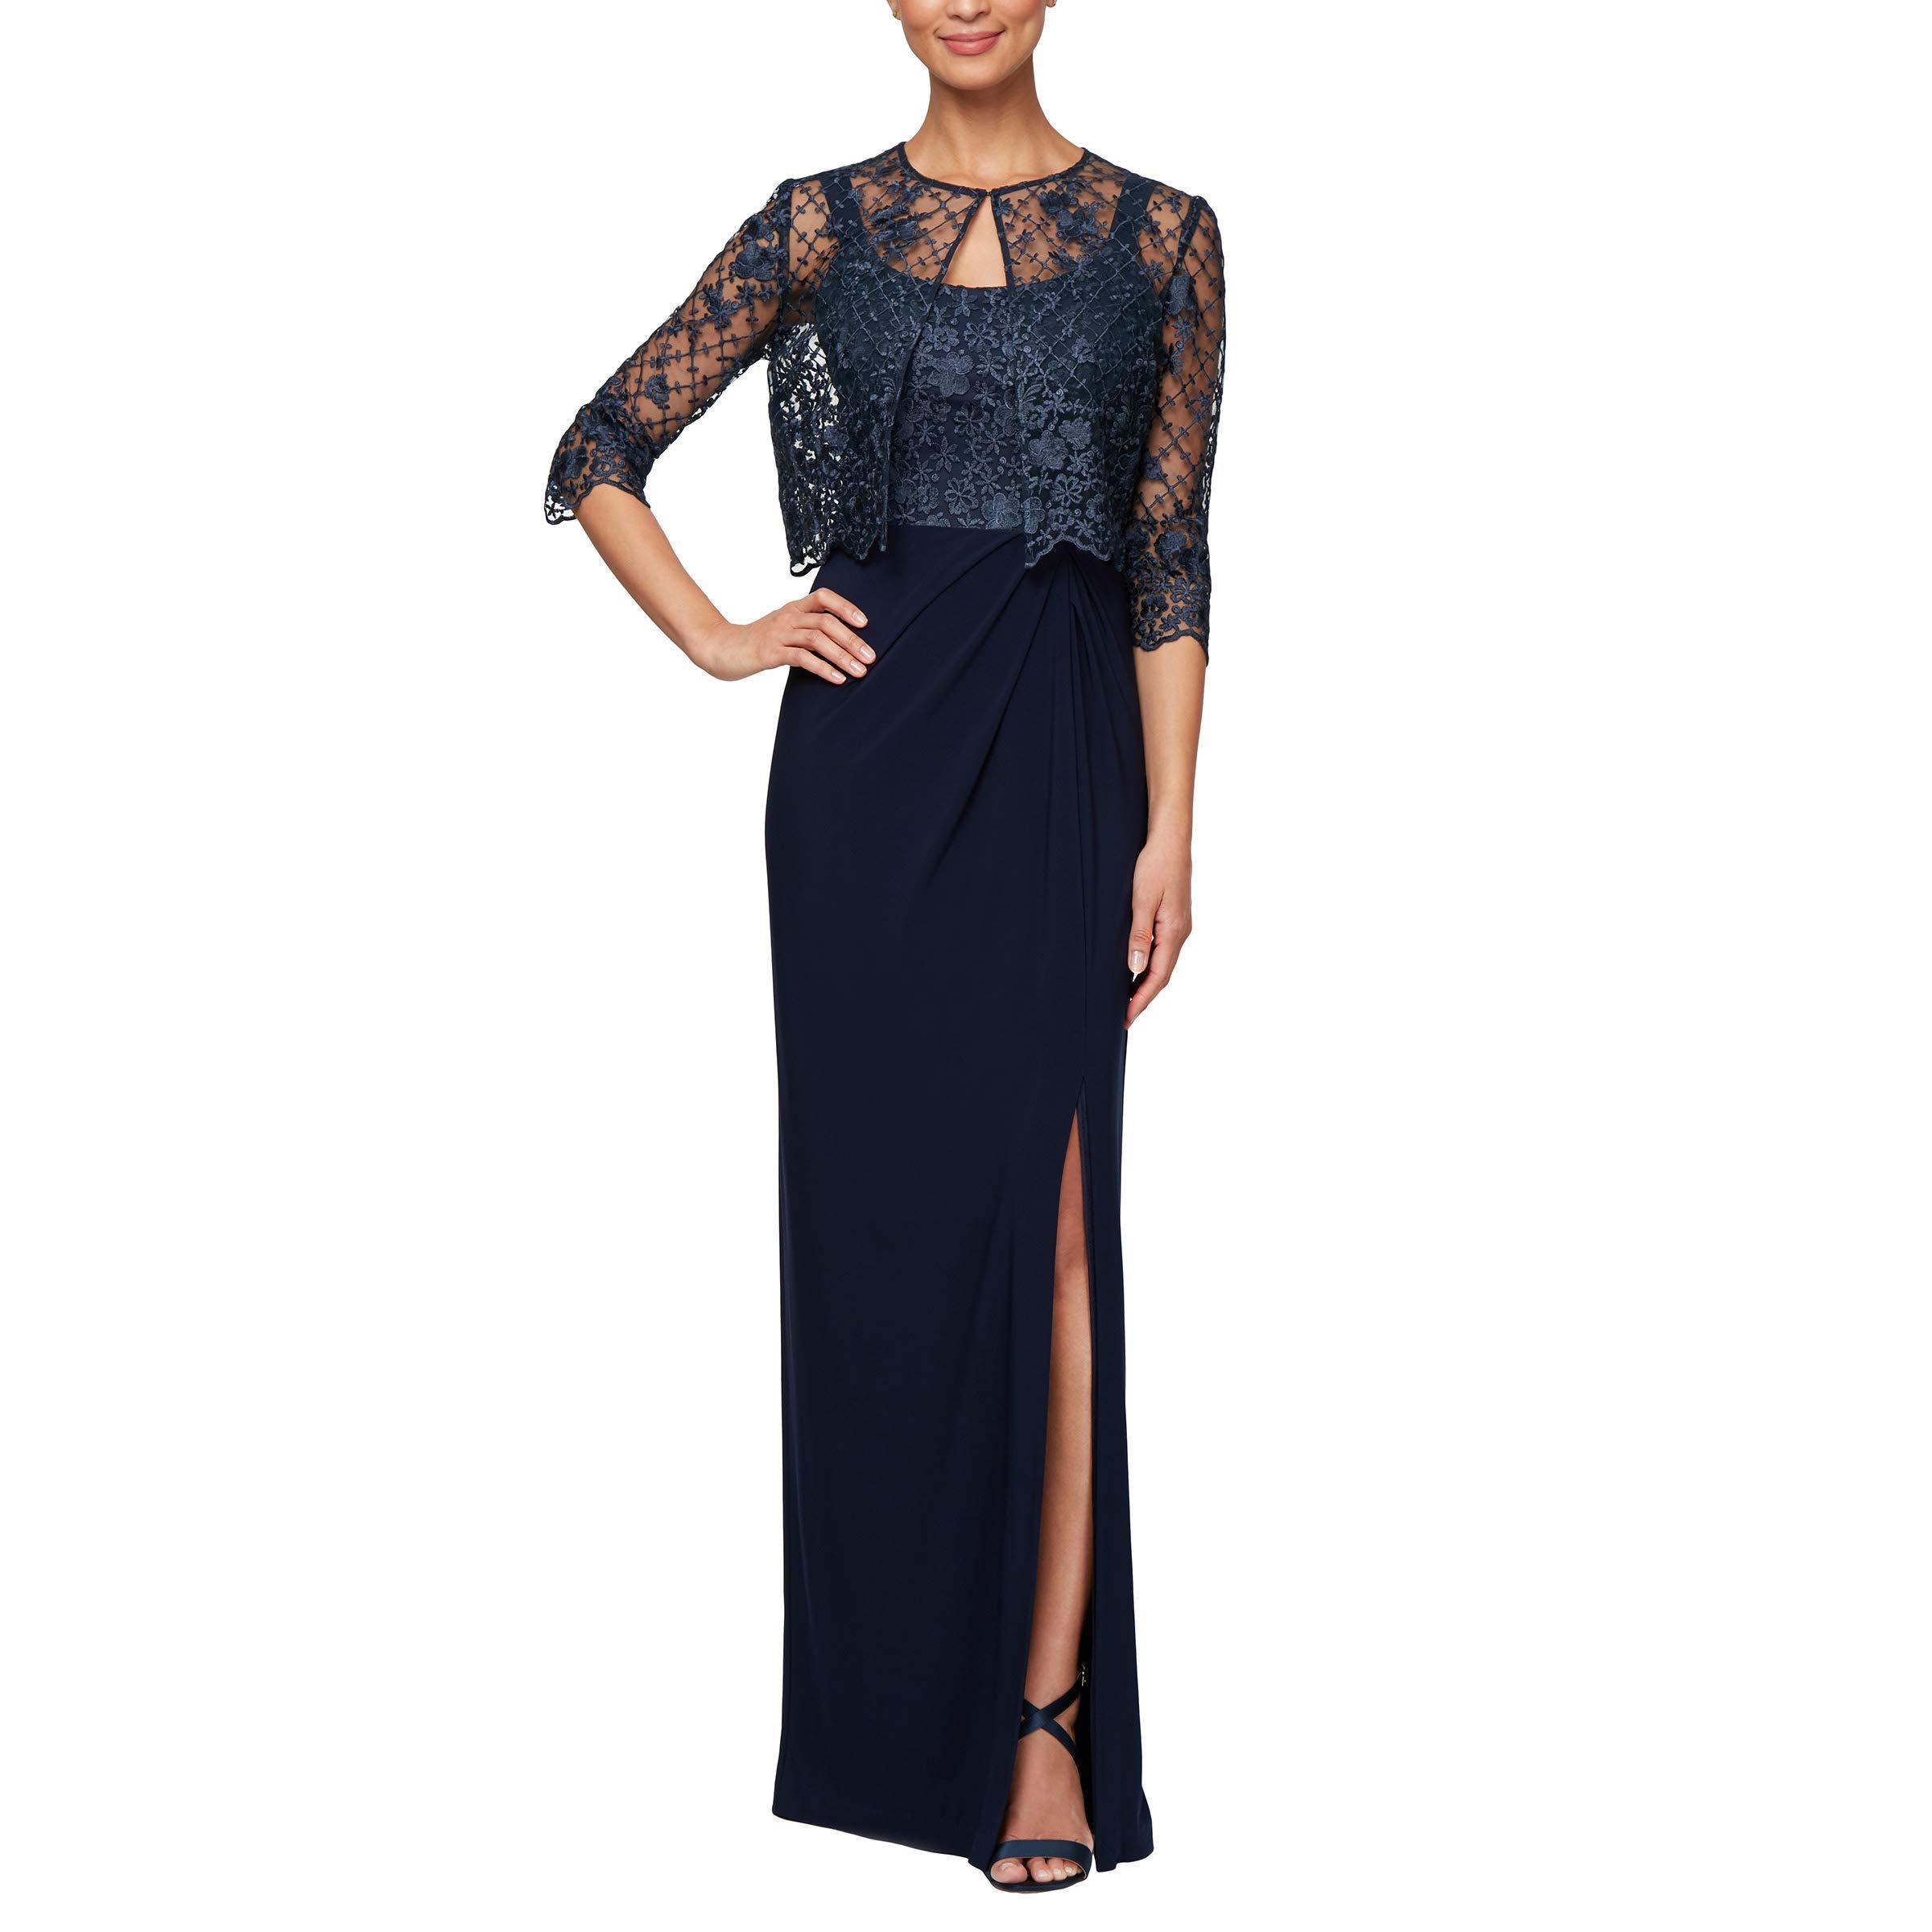 Women petite evening dresses